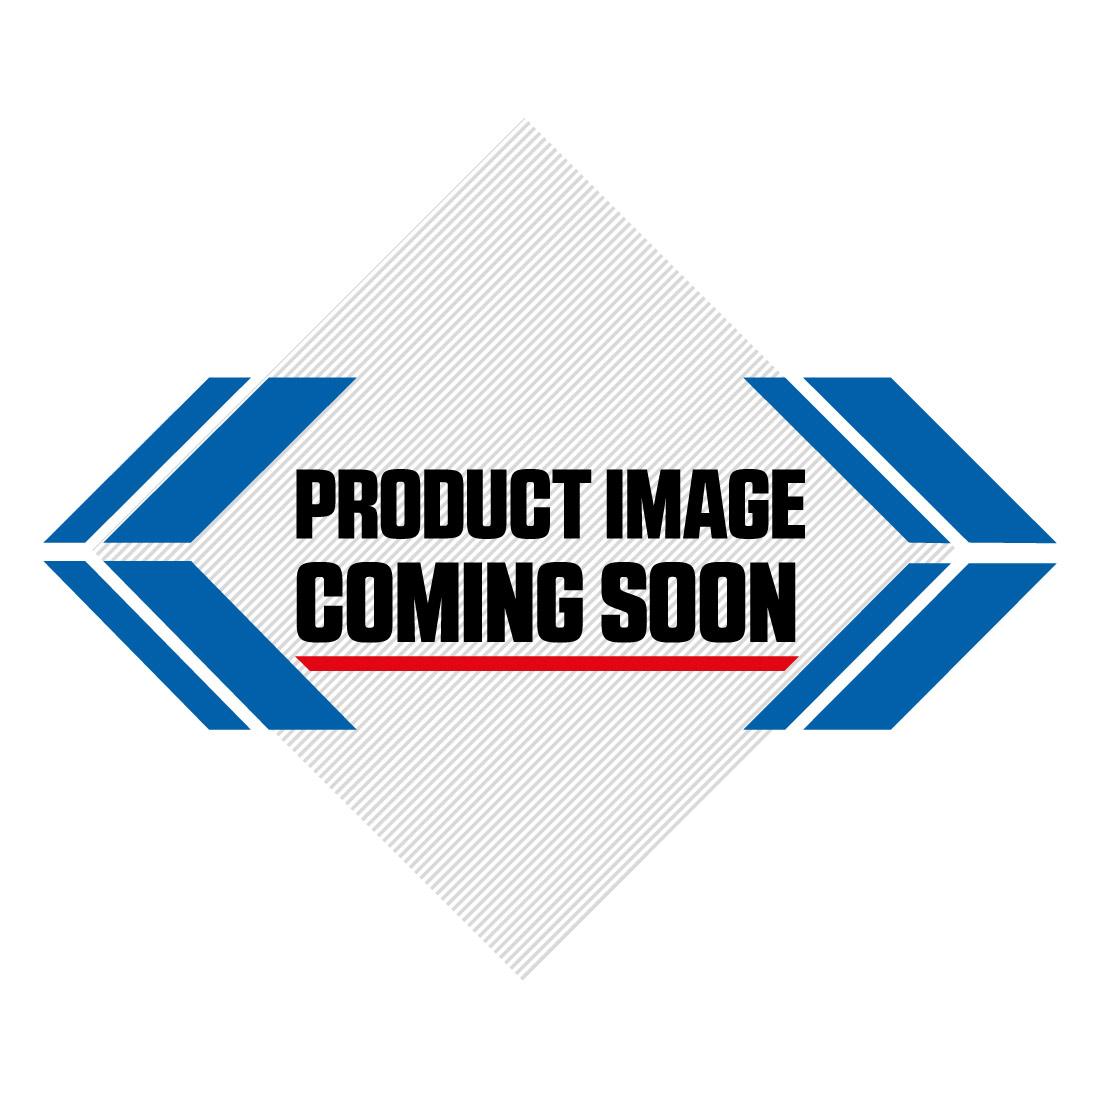 2018 Sidi Crossfire 3 SRS Cairoli Motocross Boots - Ltd Ed Yellow Flo White Image-0